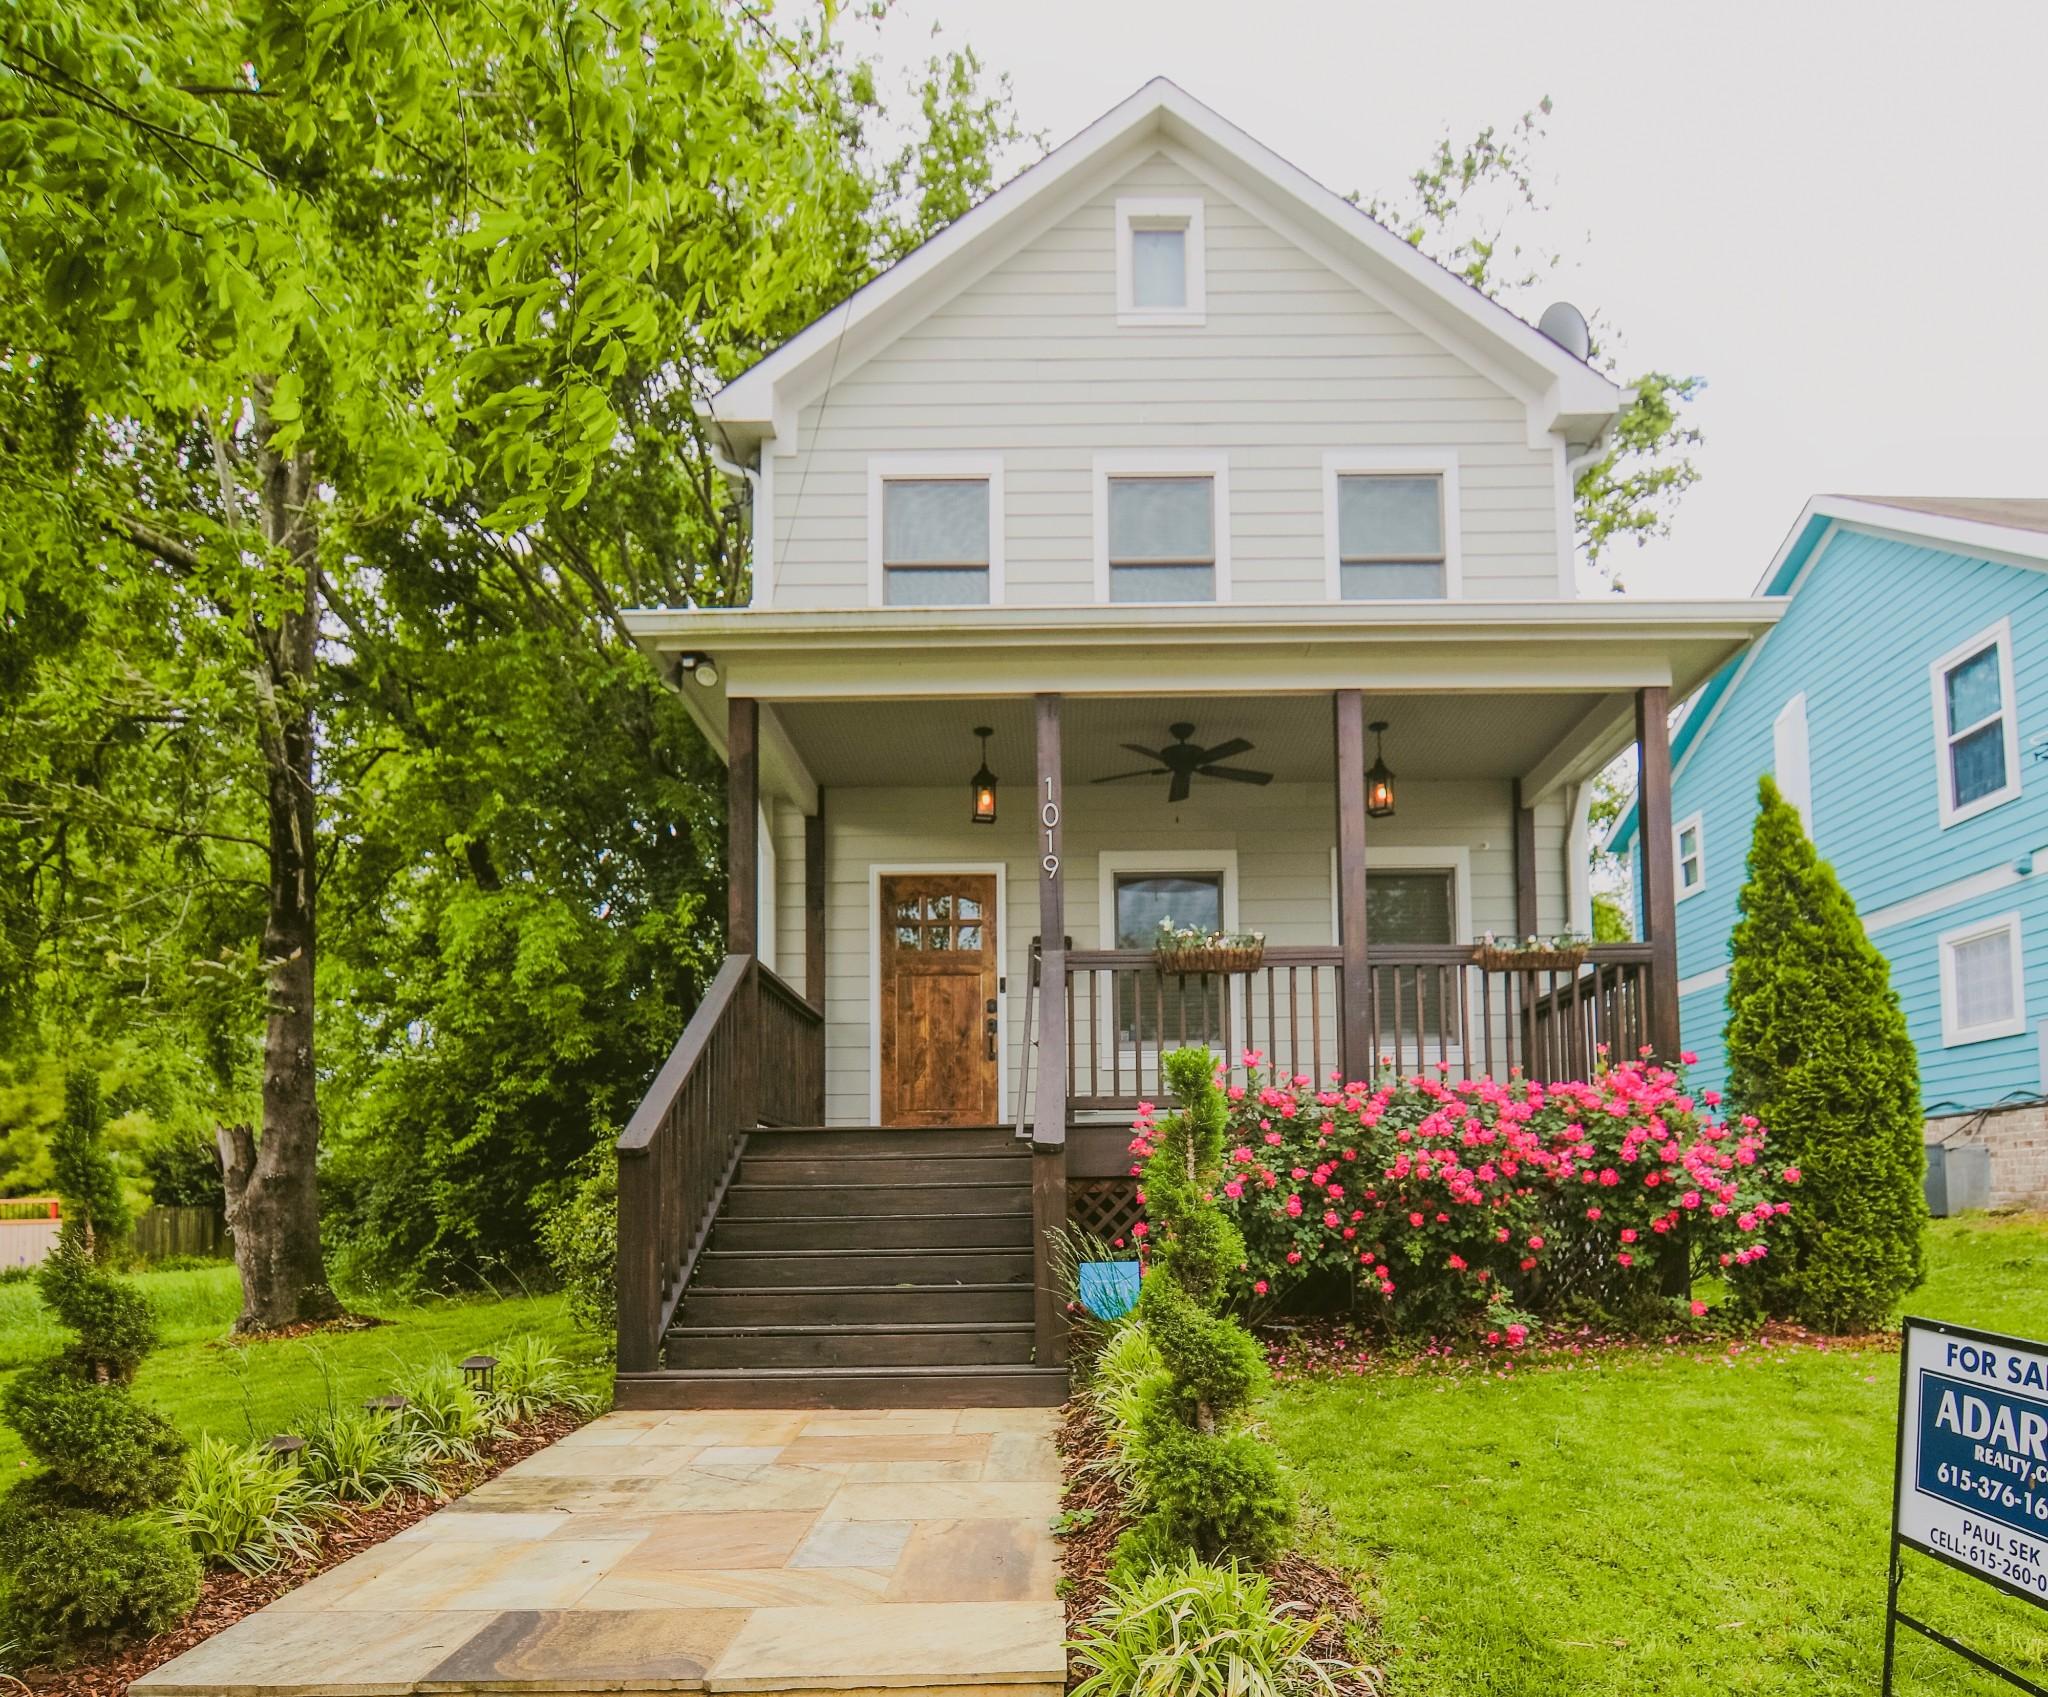 1019 11th Ave, N, Nashville, TN 37208 - Nashville, TN real estate listing